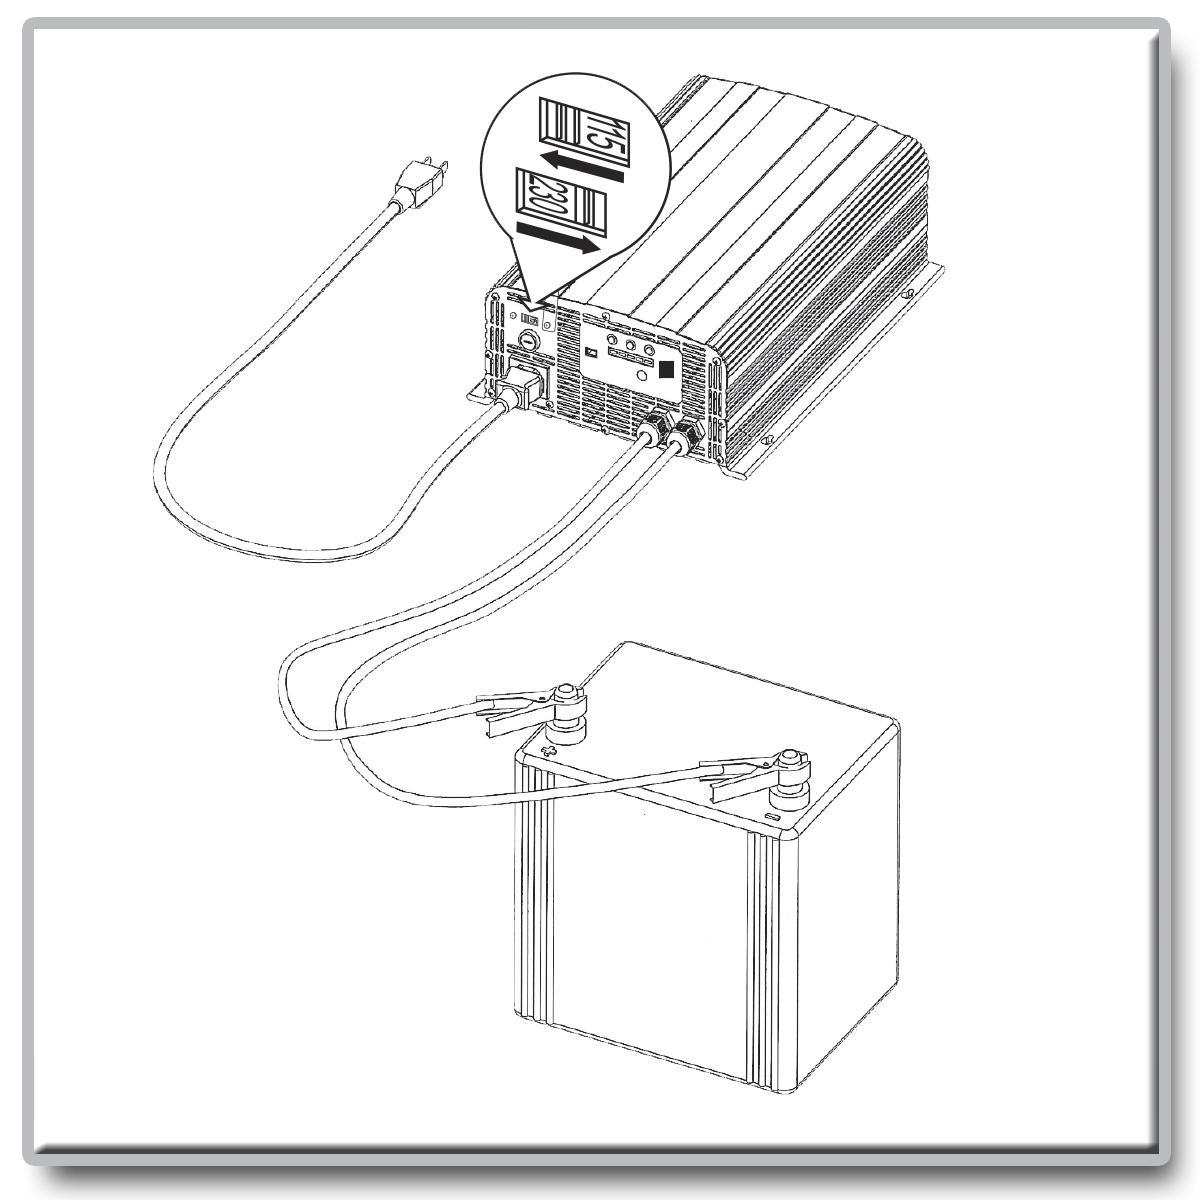 amazon com  tripp lite ubc41 4 in 1 battery charger 12v 24v 36v 48v lead acid 120  240v  home